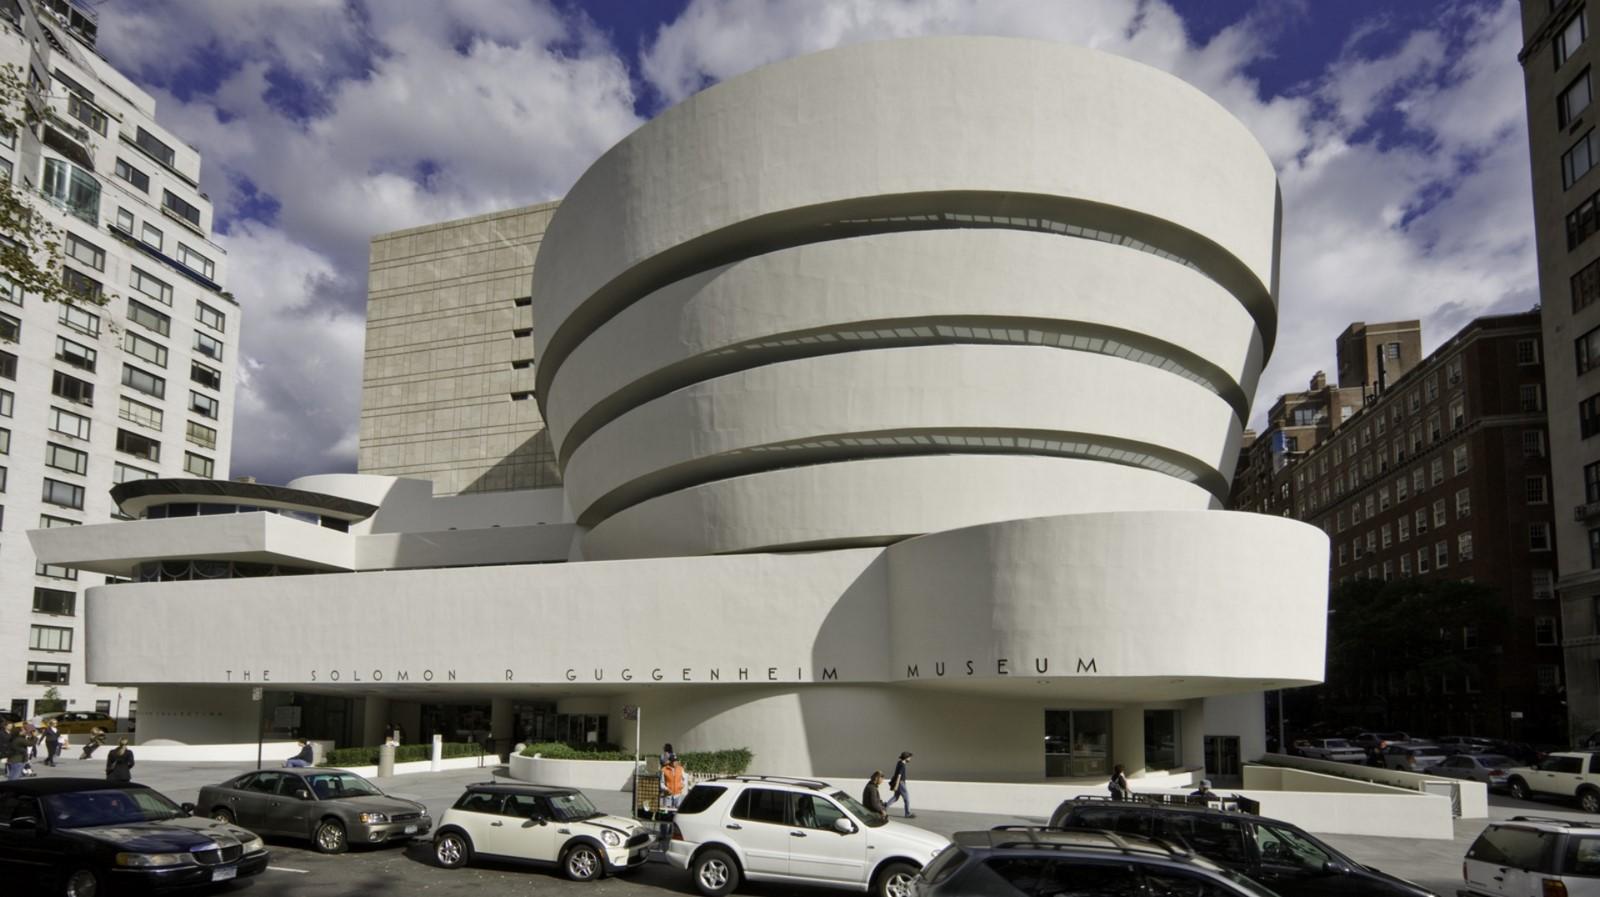 Guggenheim Museum, Manhattan, New York by Frank Lloyd Wright - Sheet1